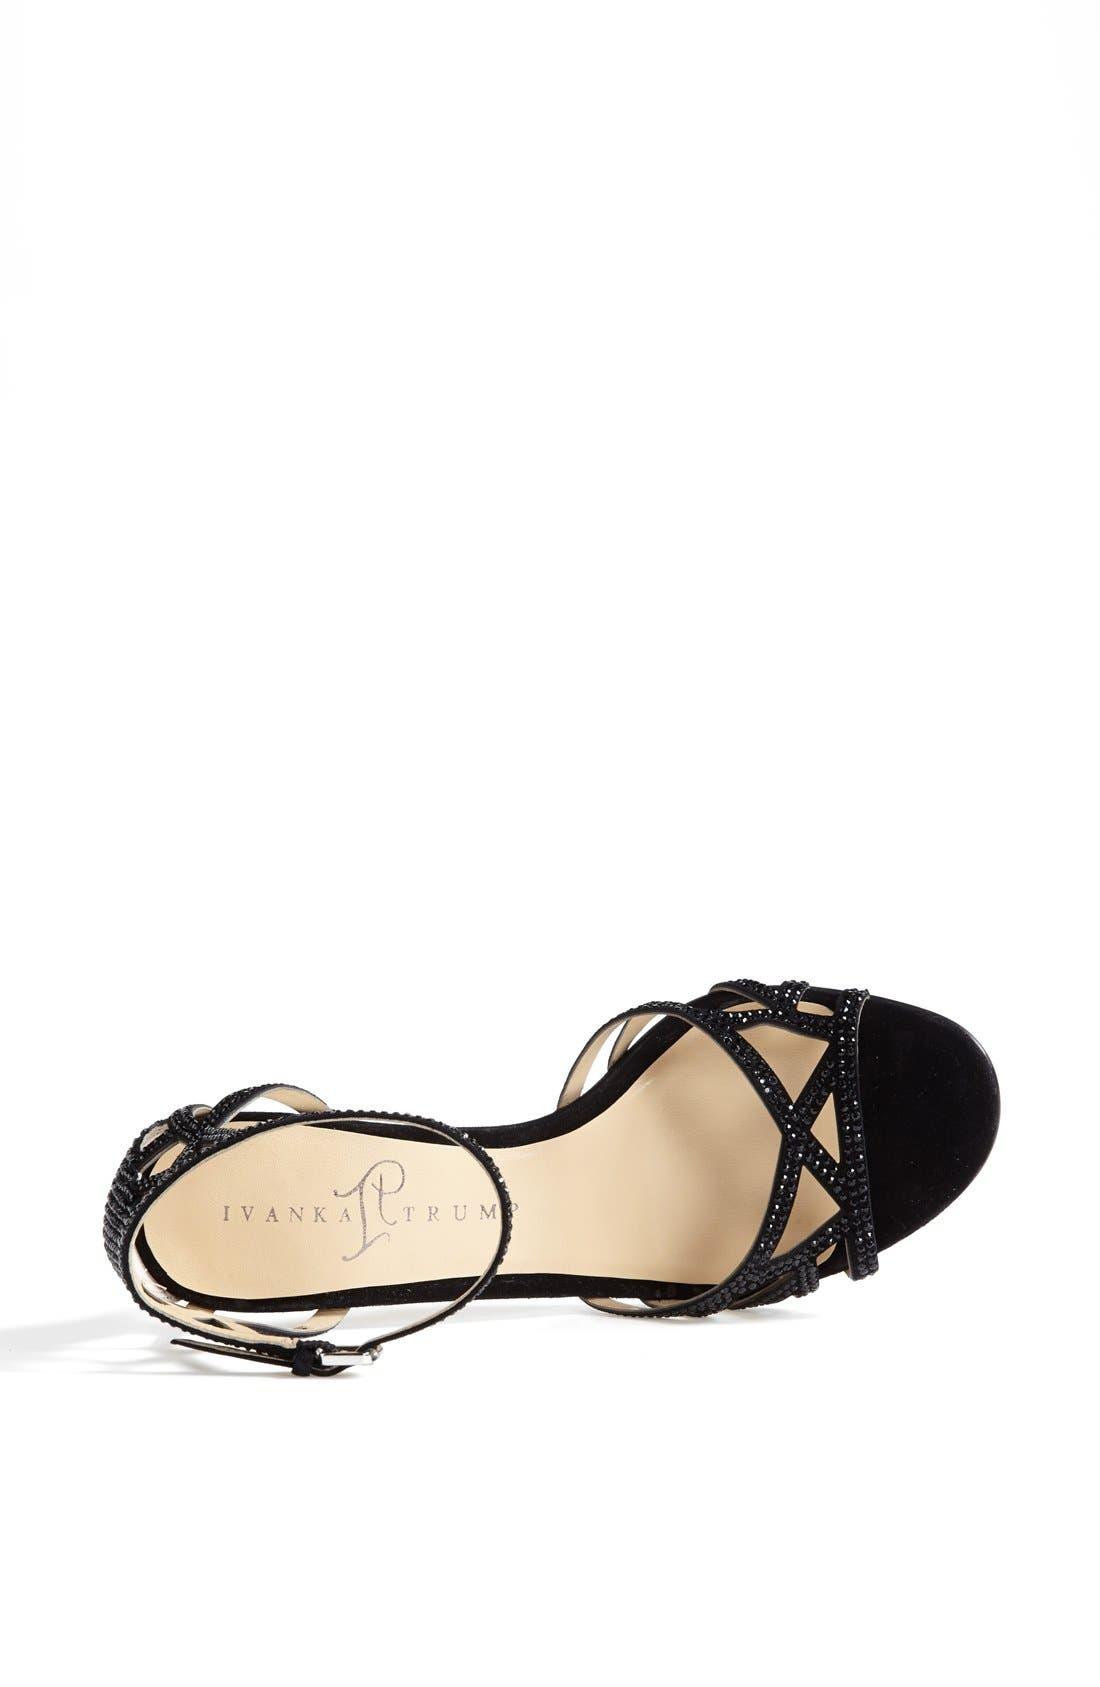 IVANKA TRUMP, 'Gifford' Crystal Embellished Sandal, Alternate thumbnail 2, color, 001